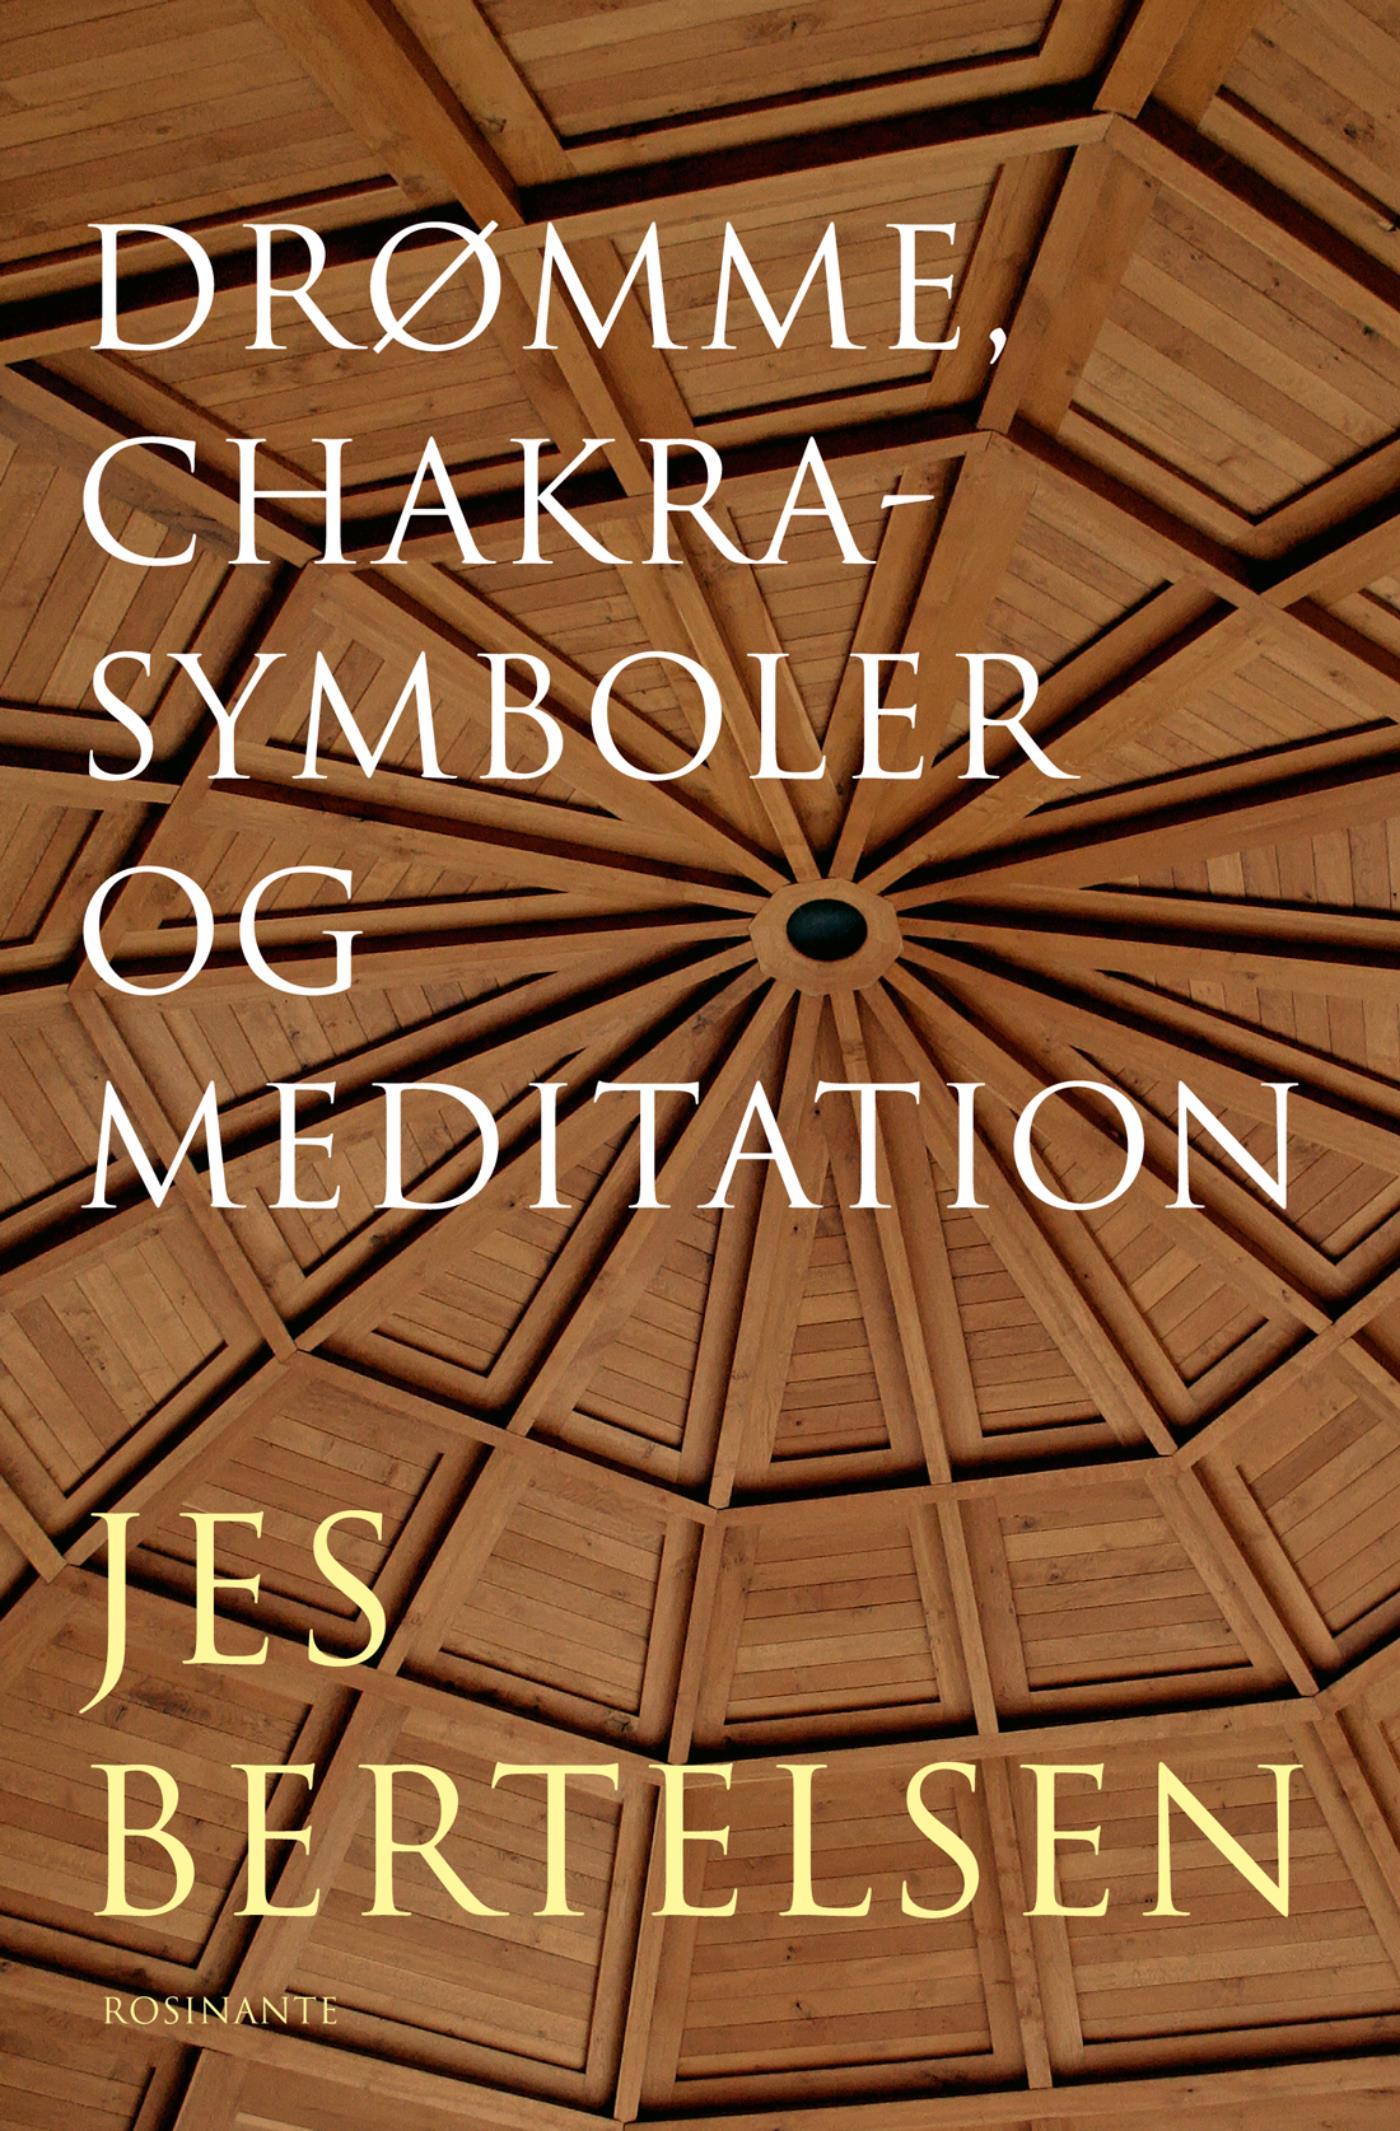 N/A Drømme, chakrasymboler og meditation - e-bog fra bog & mystik